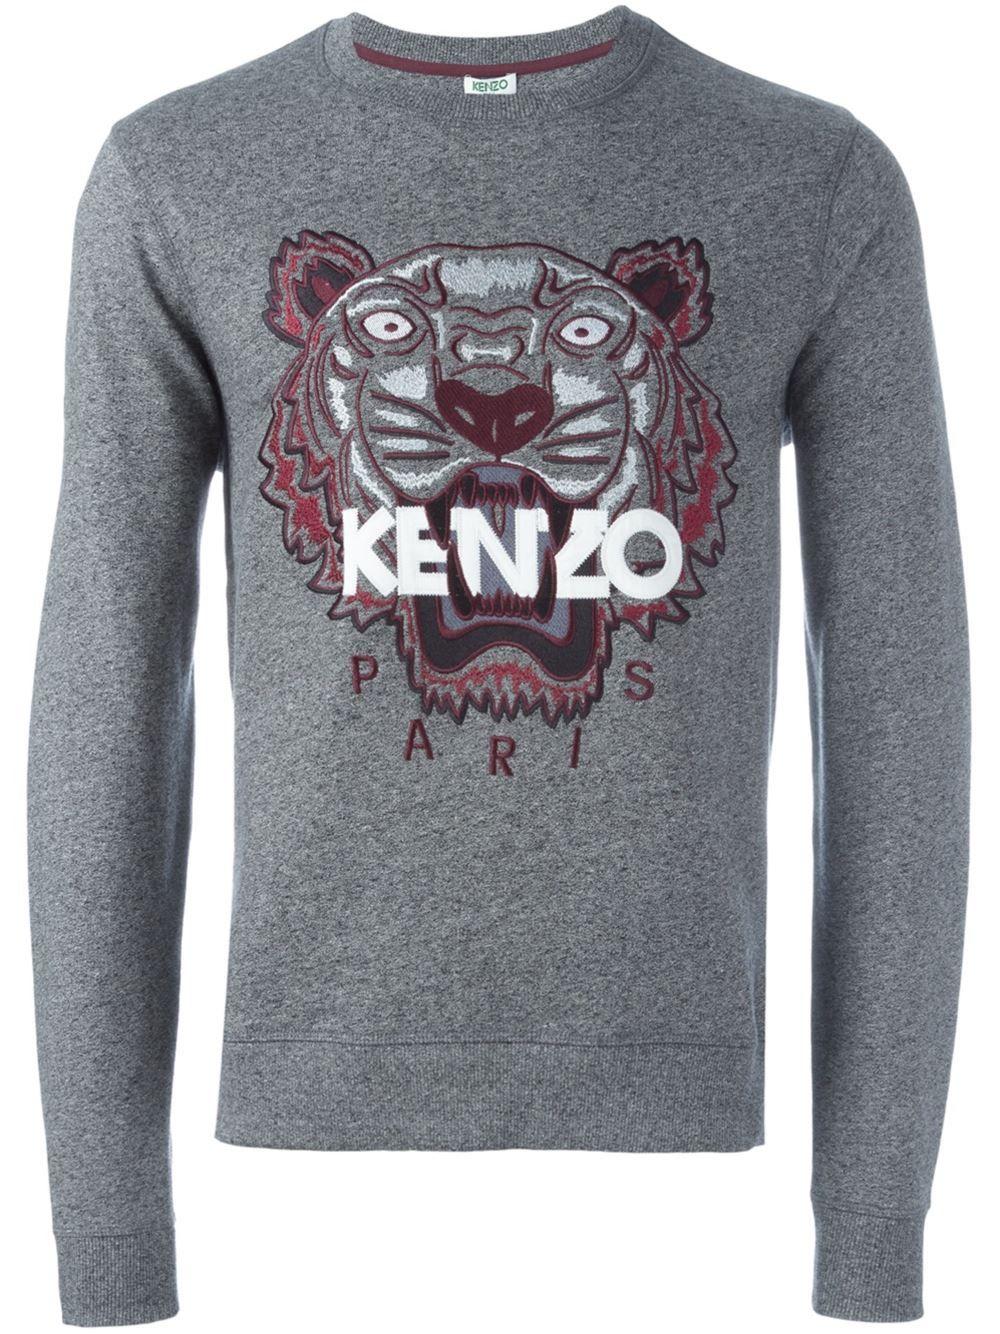 Sweatshirt Tigre | Pull kenzo, Vetements